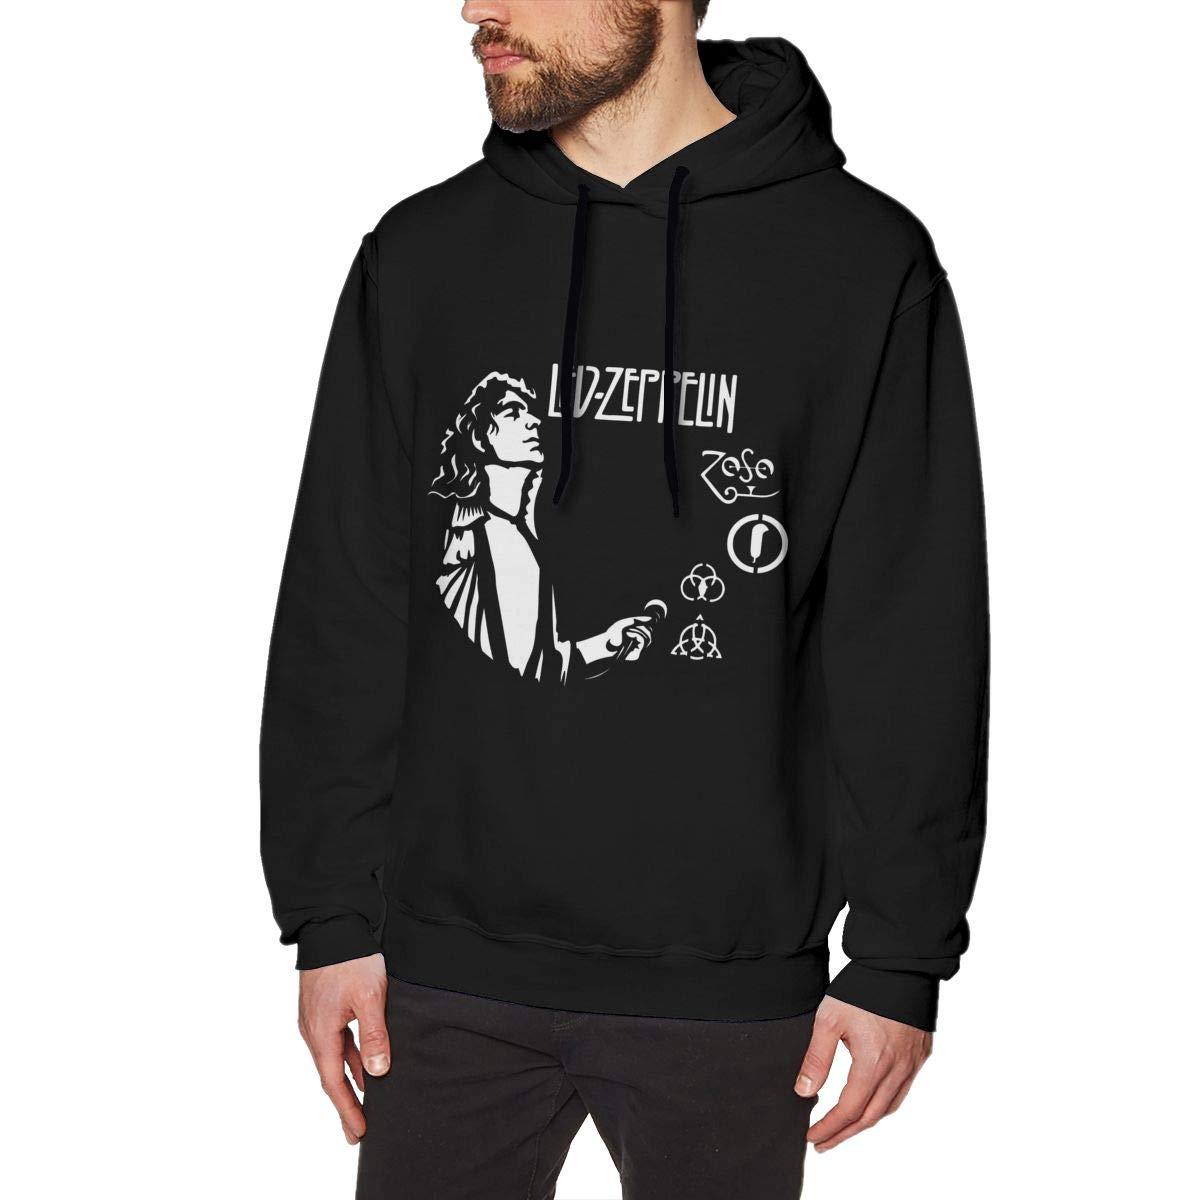 Anegl Masz Led Zeppelin Mens Hooded Sweatshirt Nordic Winter Personality Wild